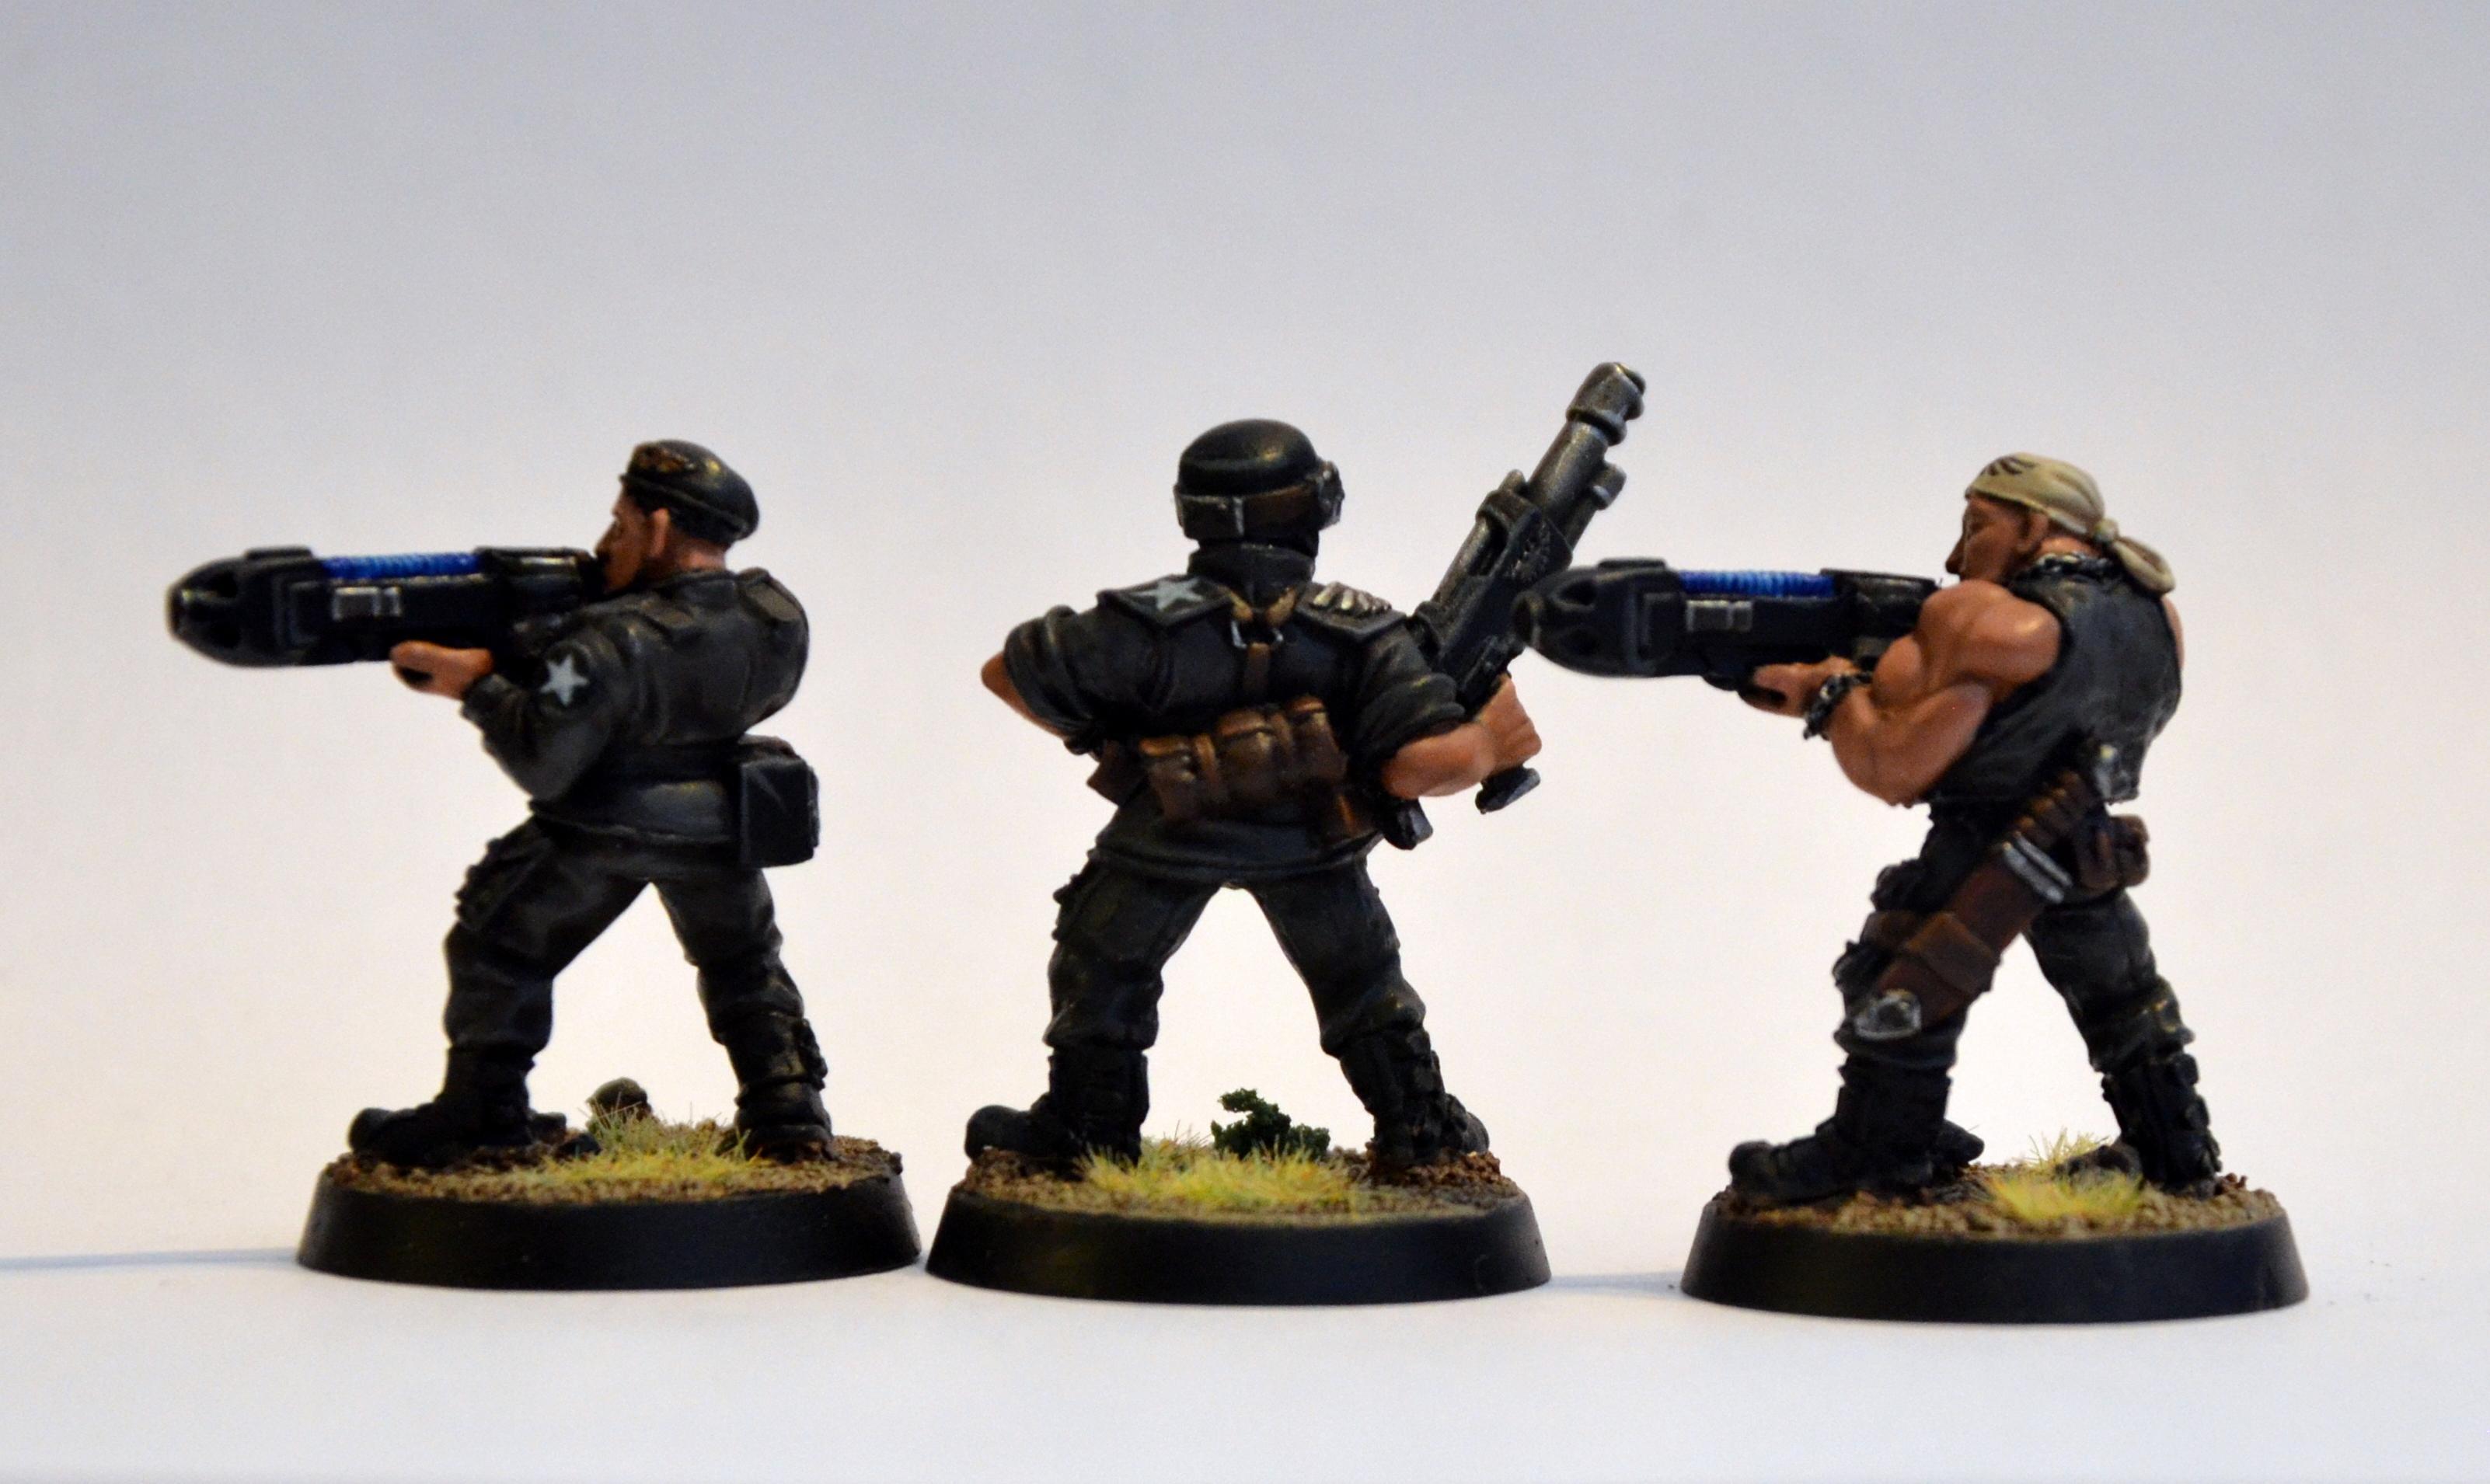 Astra Militarum, Cadians, Imperial Guard, Warhammer 40,000